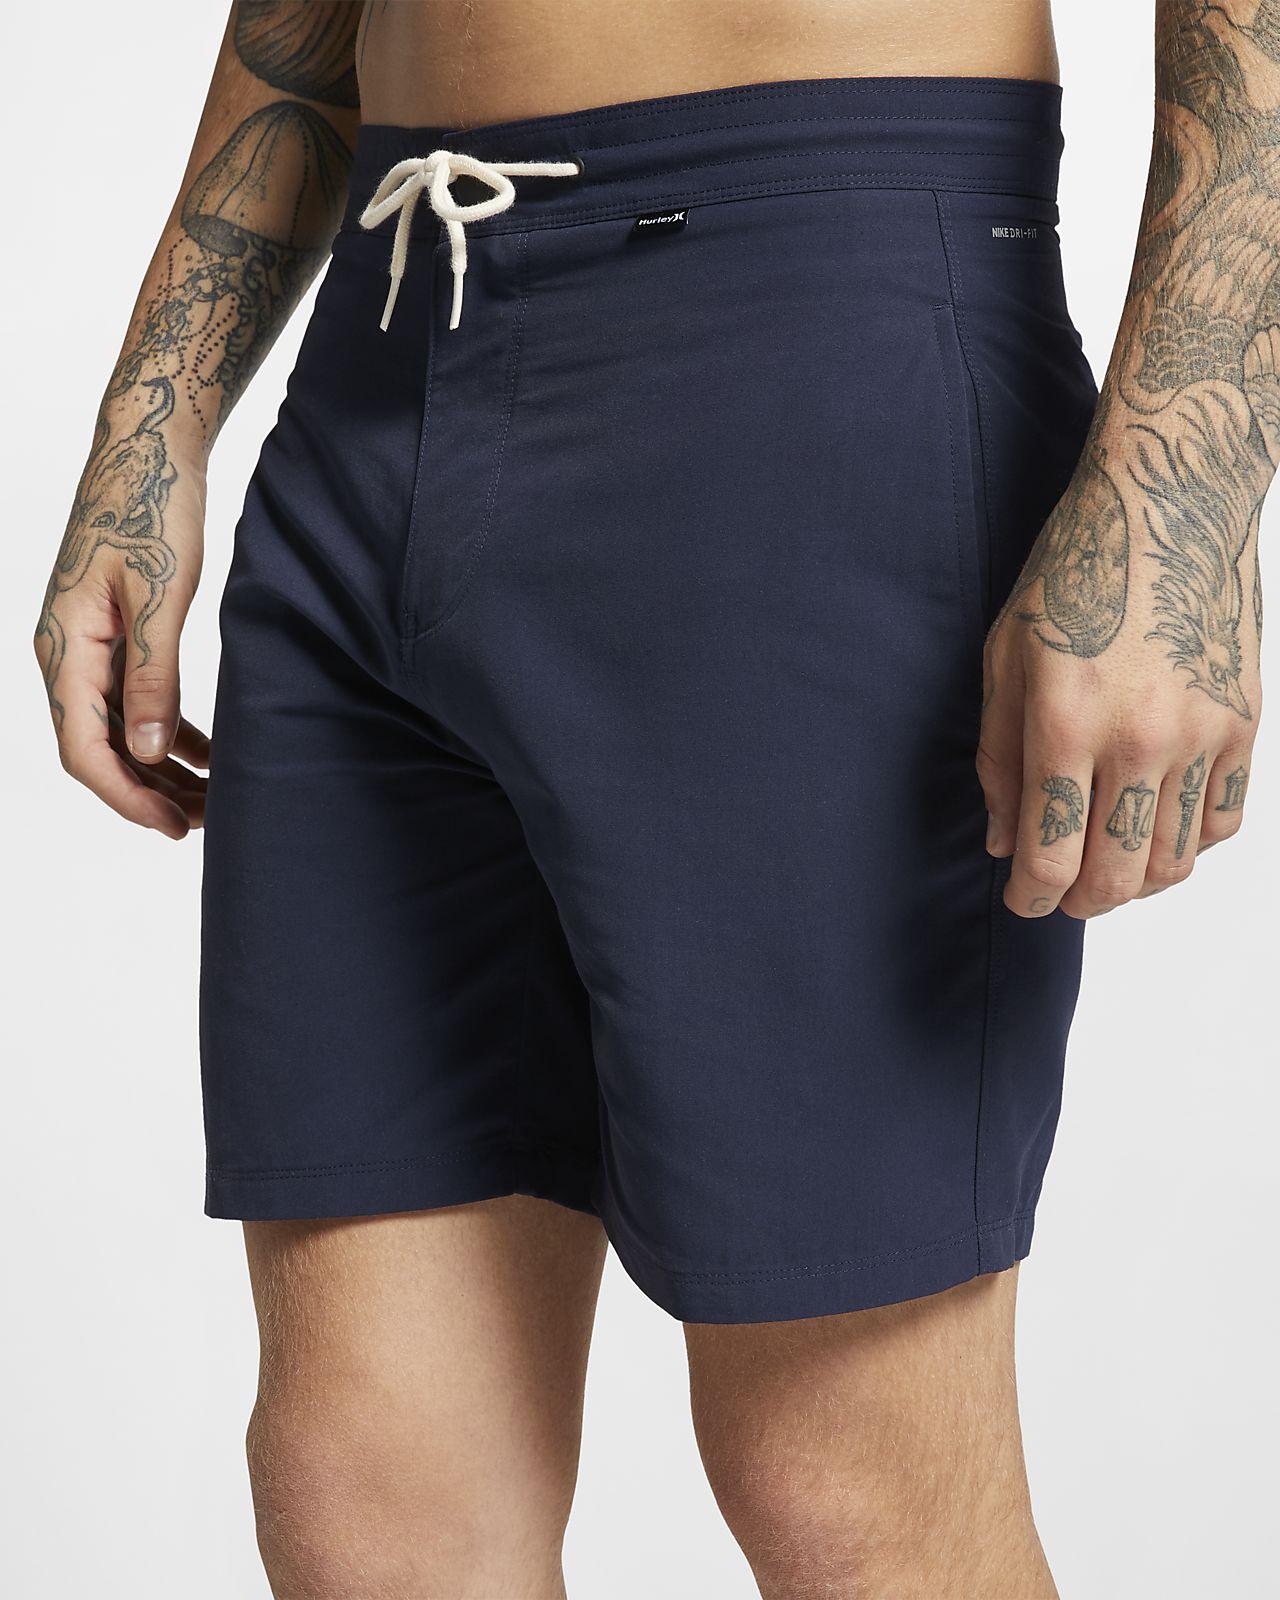 Hurley Dri-FIT Brooks Pantalons curts de 46 cm - Home